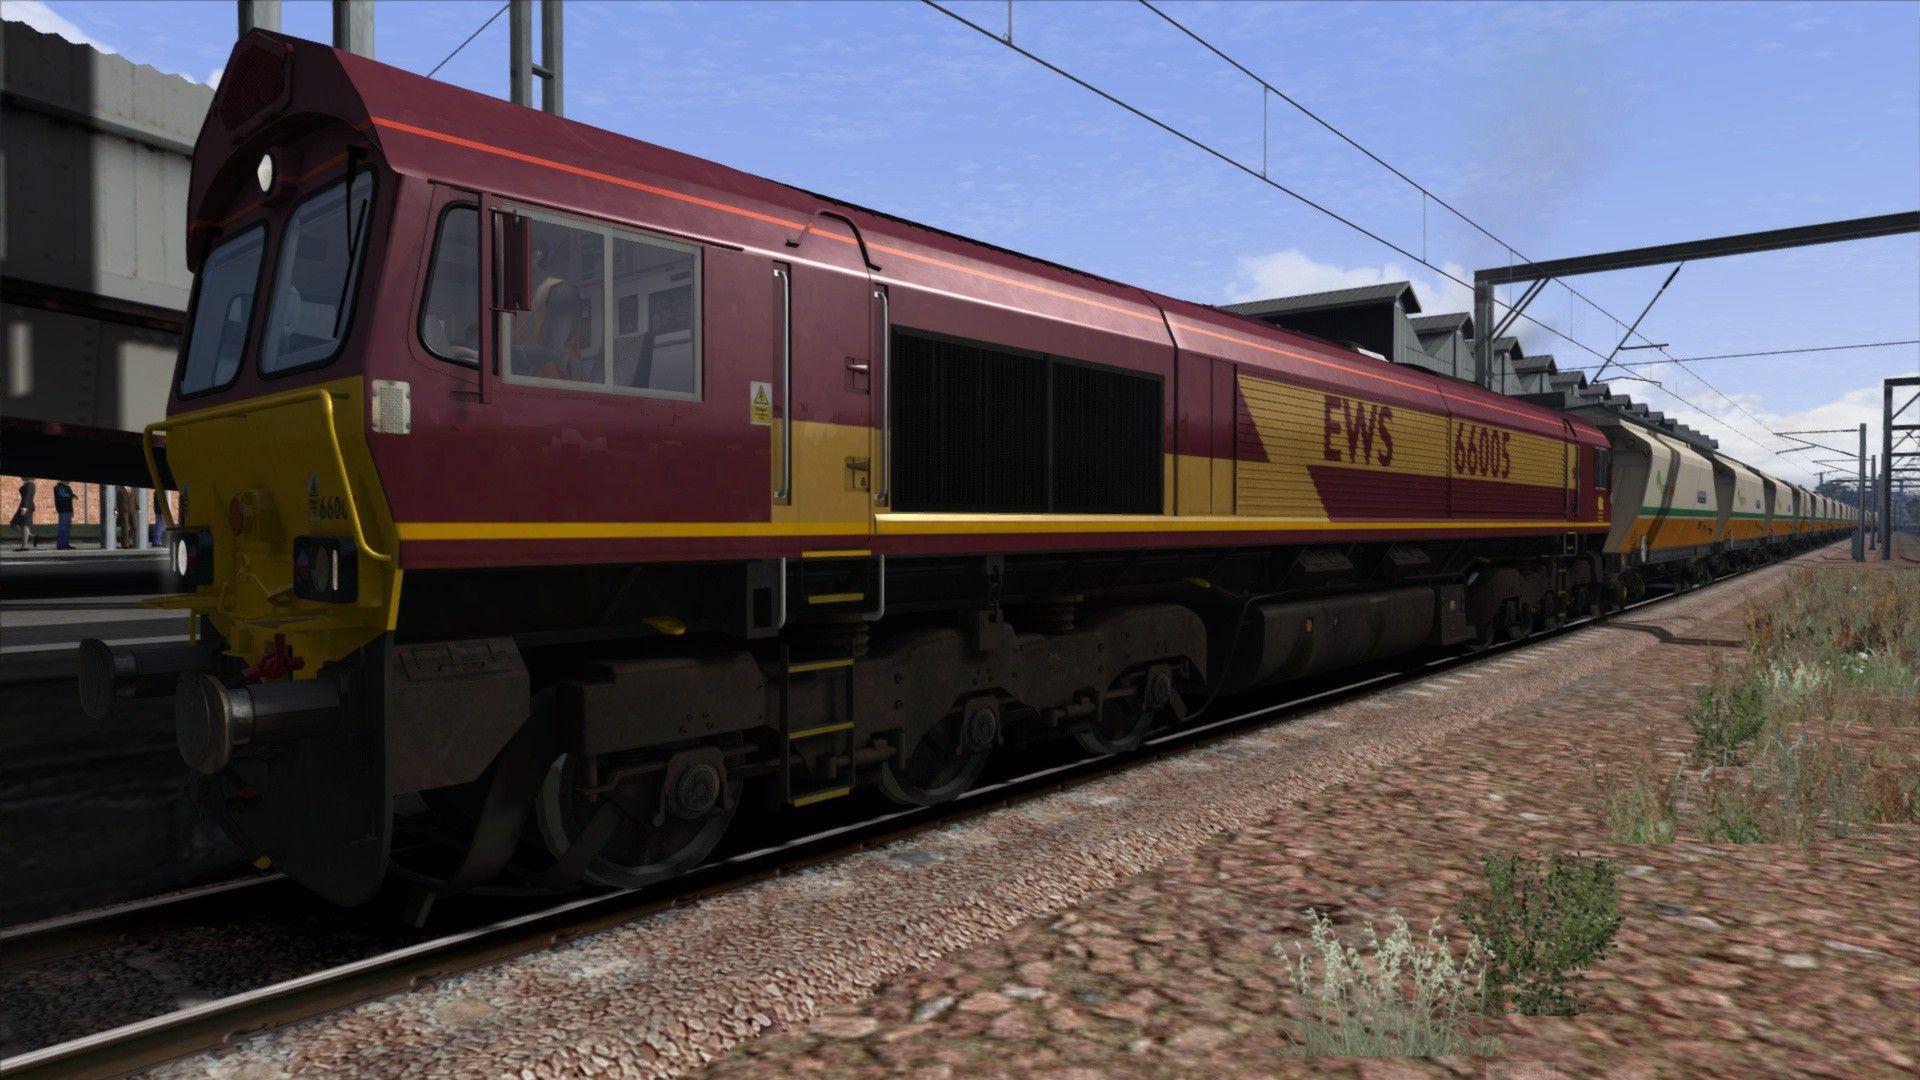 EWS6604